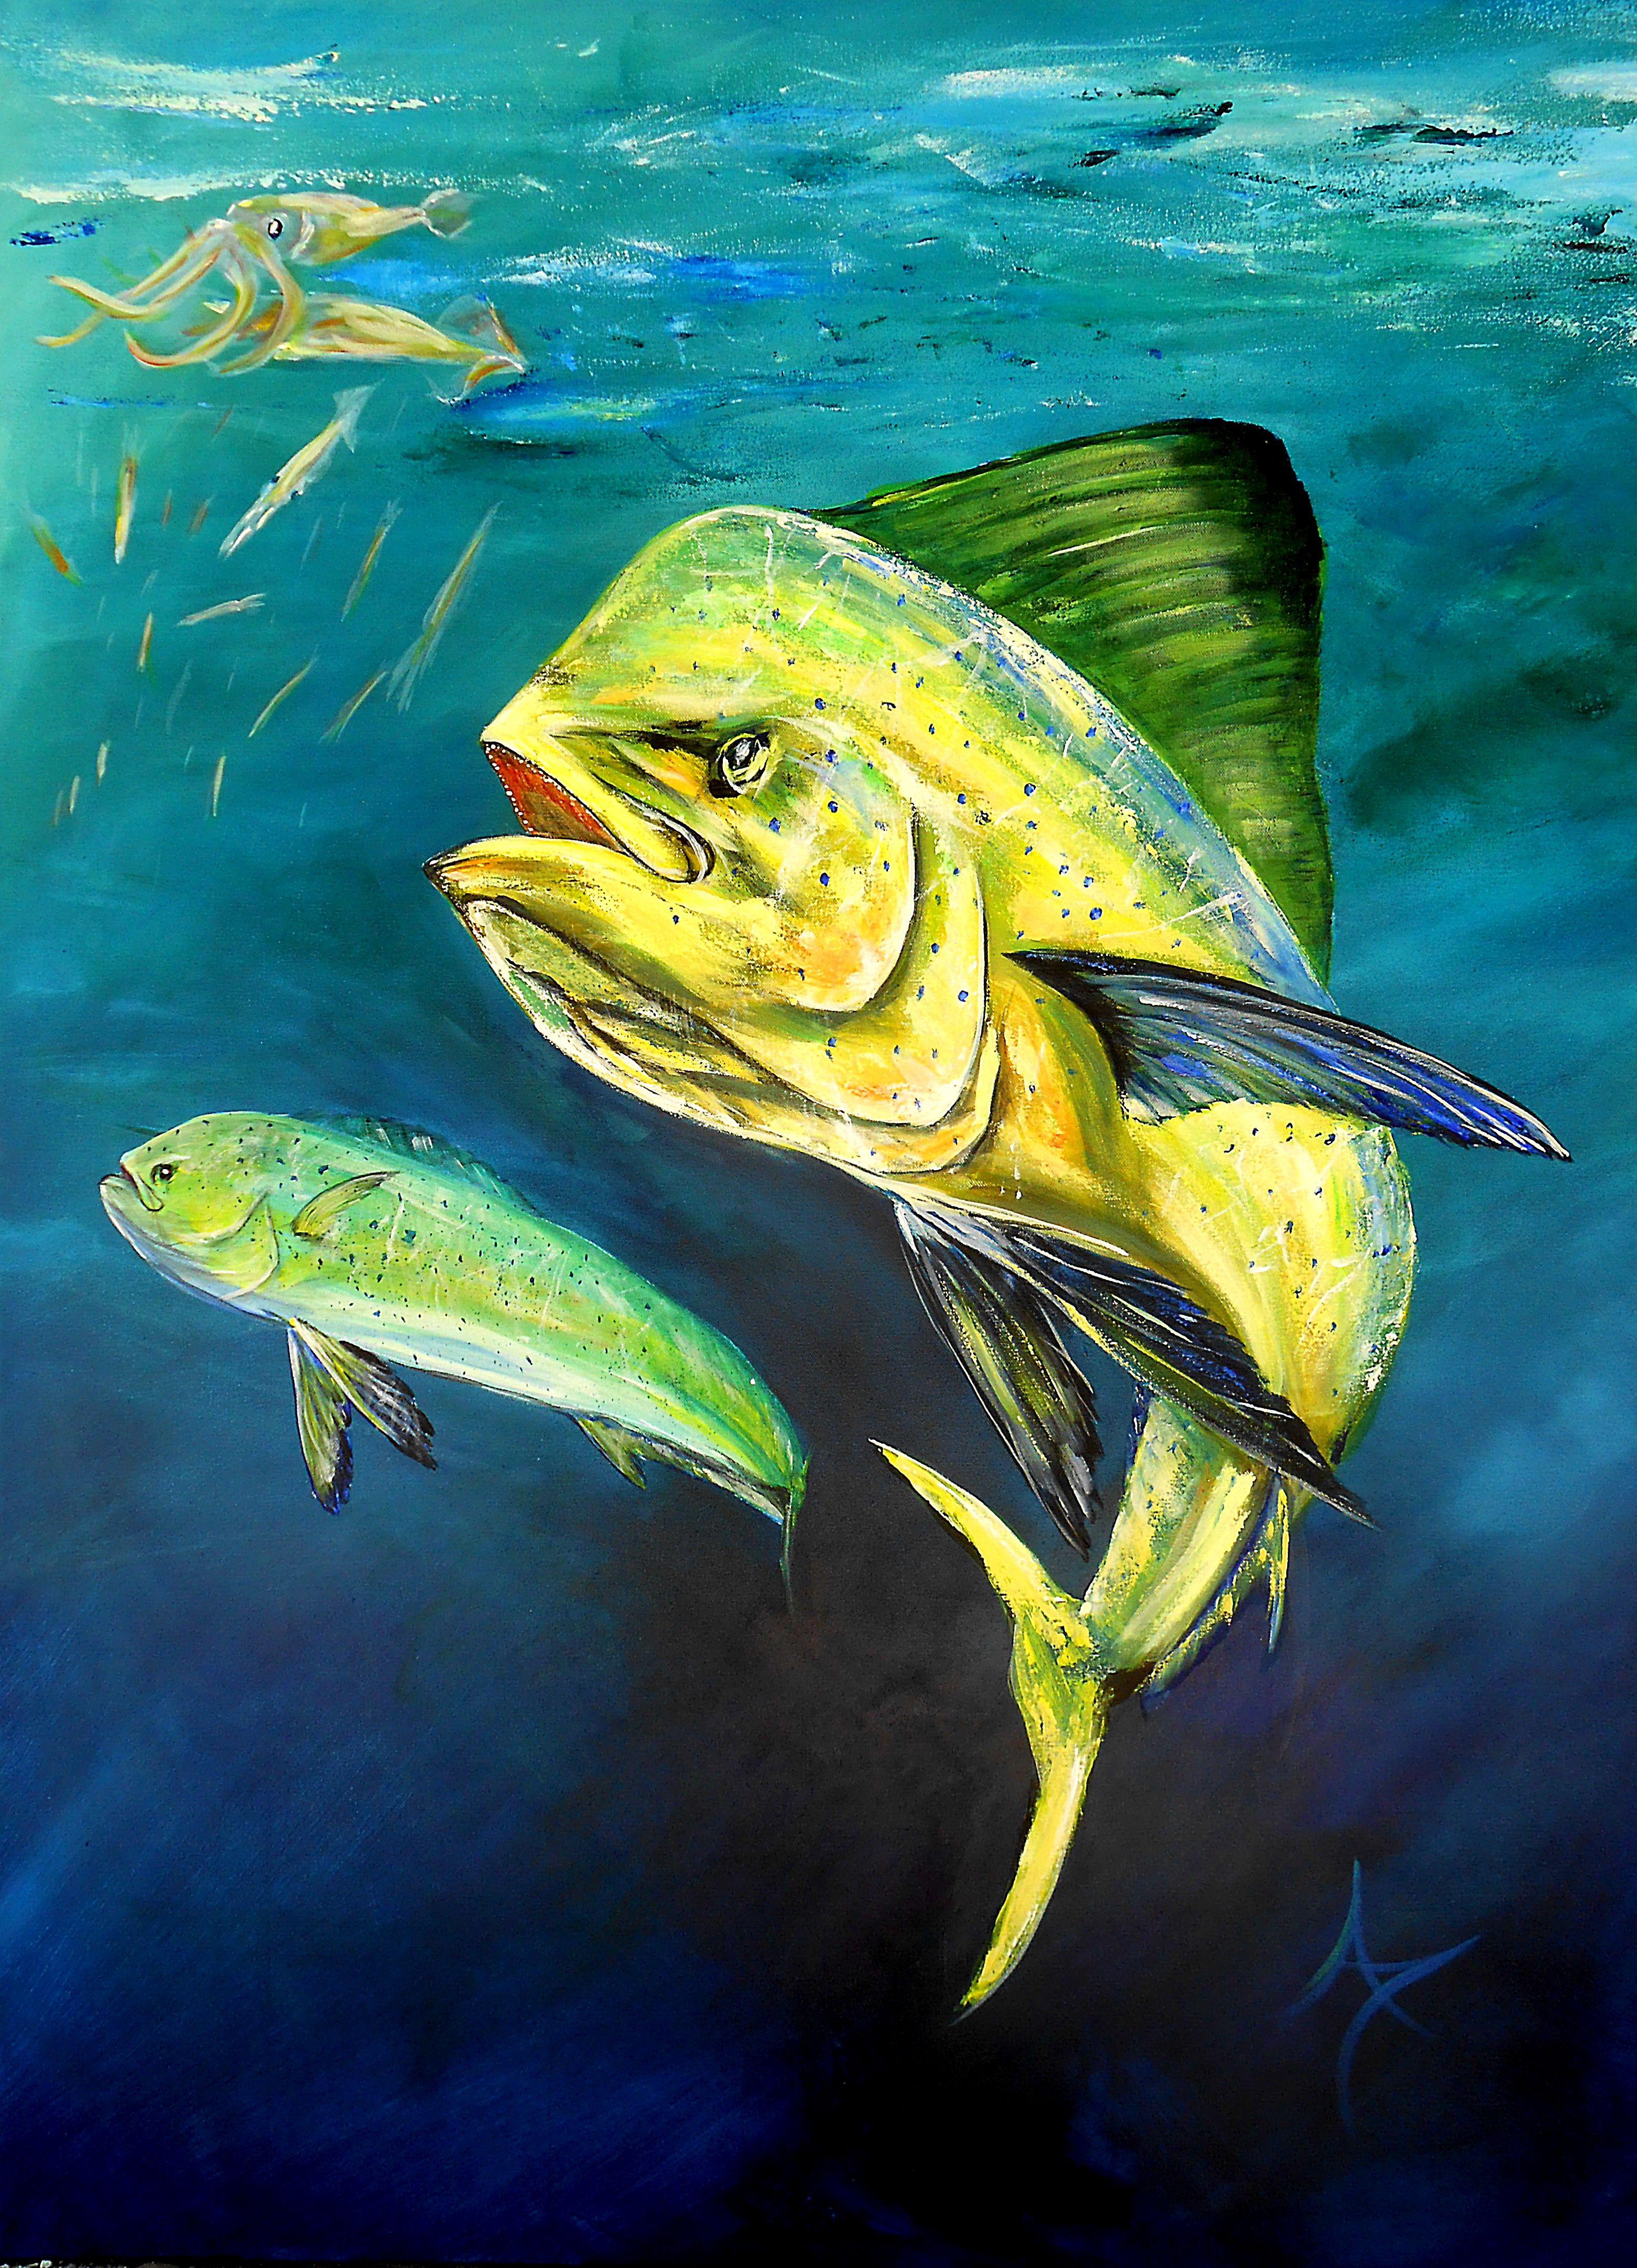 wwwannettetauntoncom mahi mahi fish water ocean beaches florida fish artwork fish art